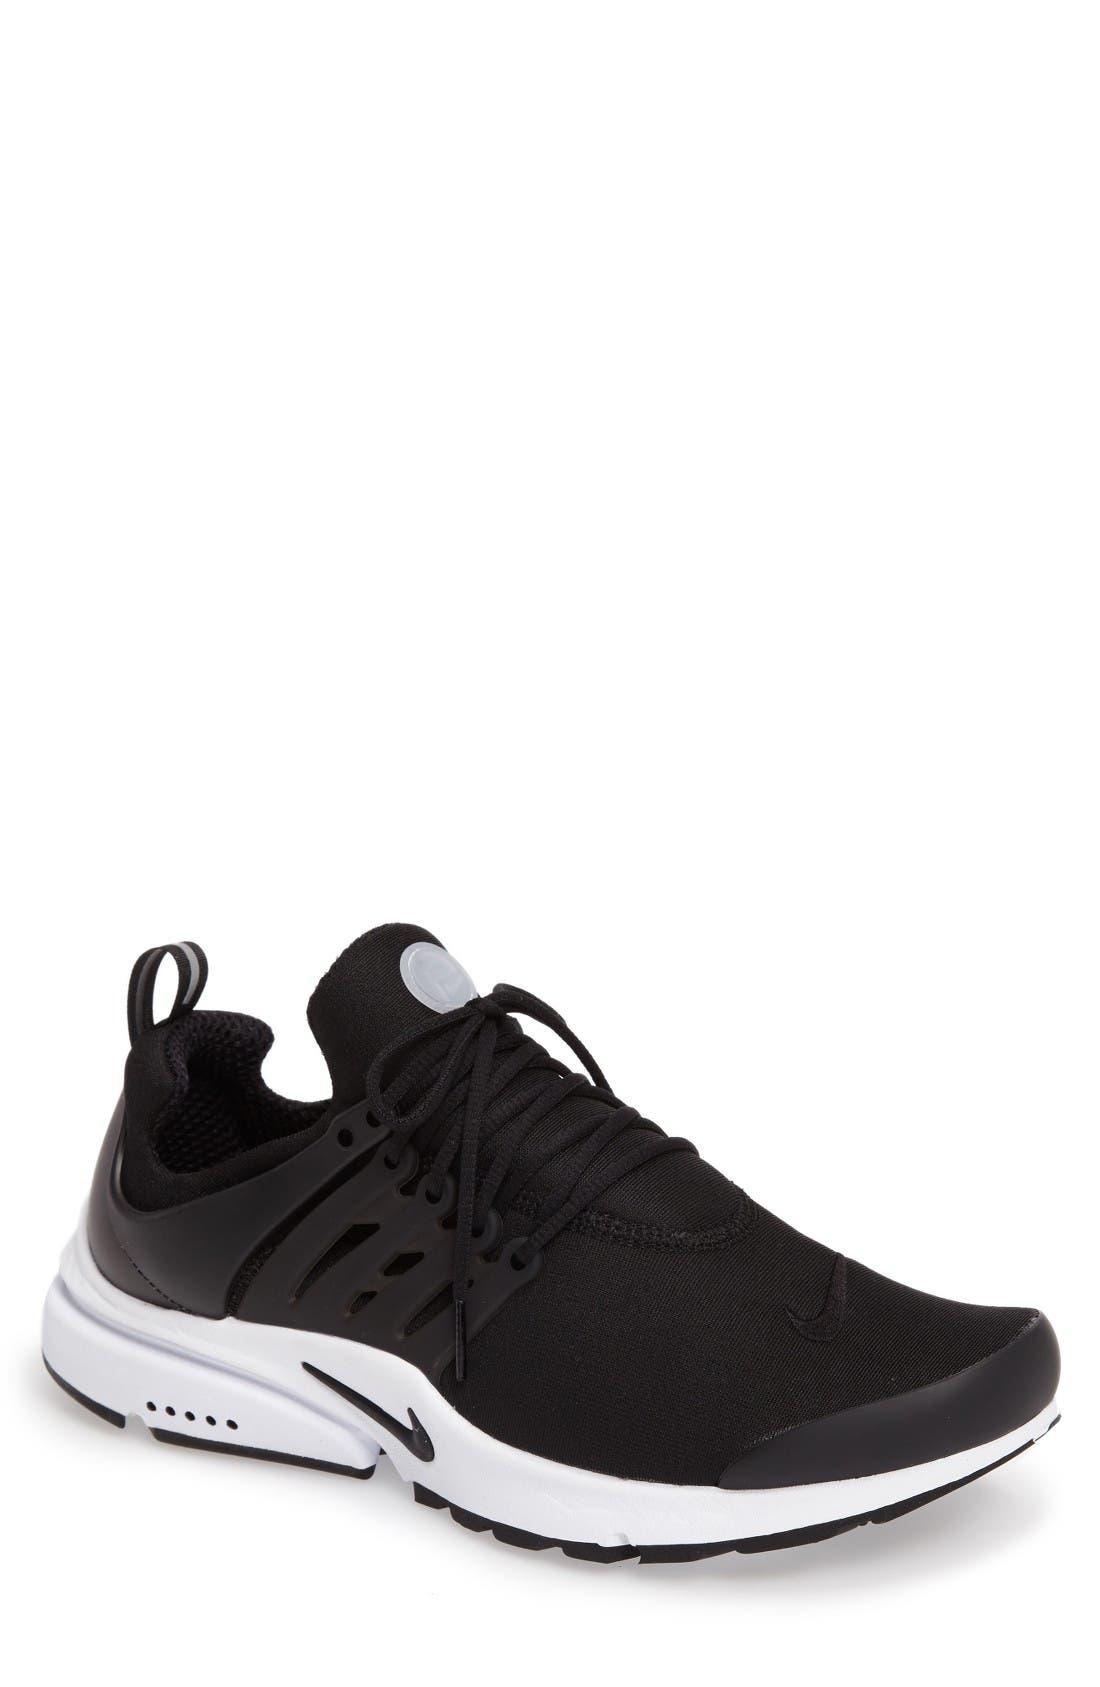 Air Presto Essential Sneaker,                             Main thumbnail 1, color,                             Black/ Black/ White